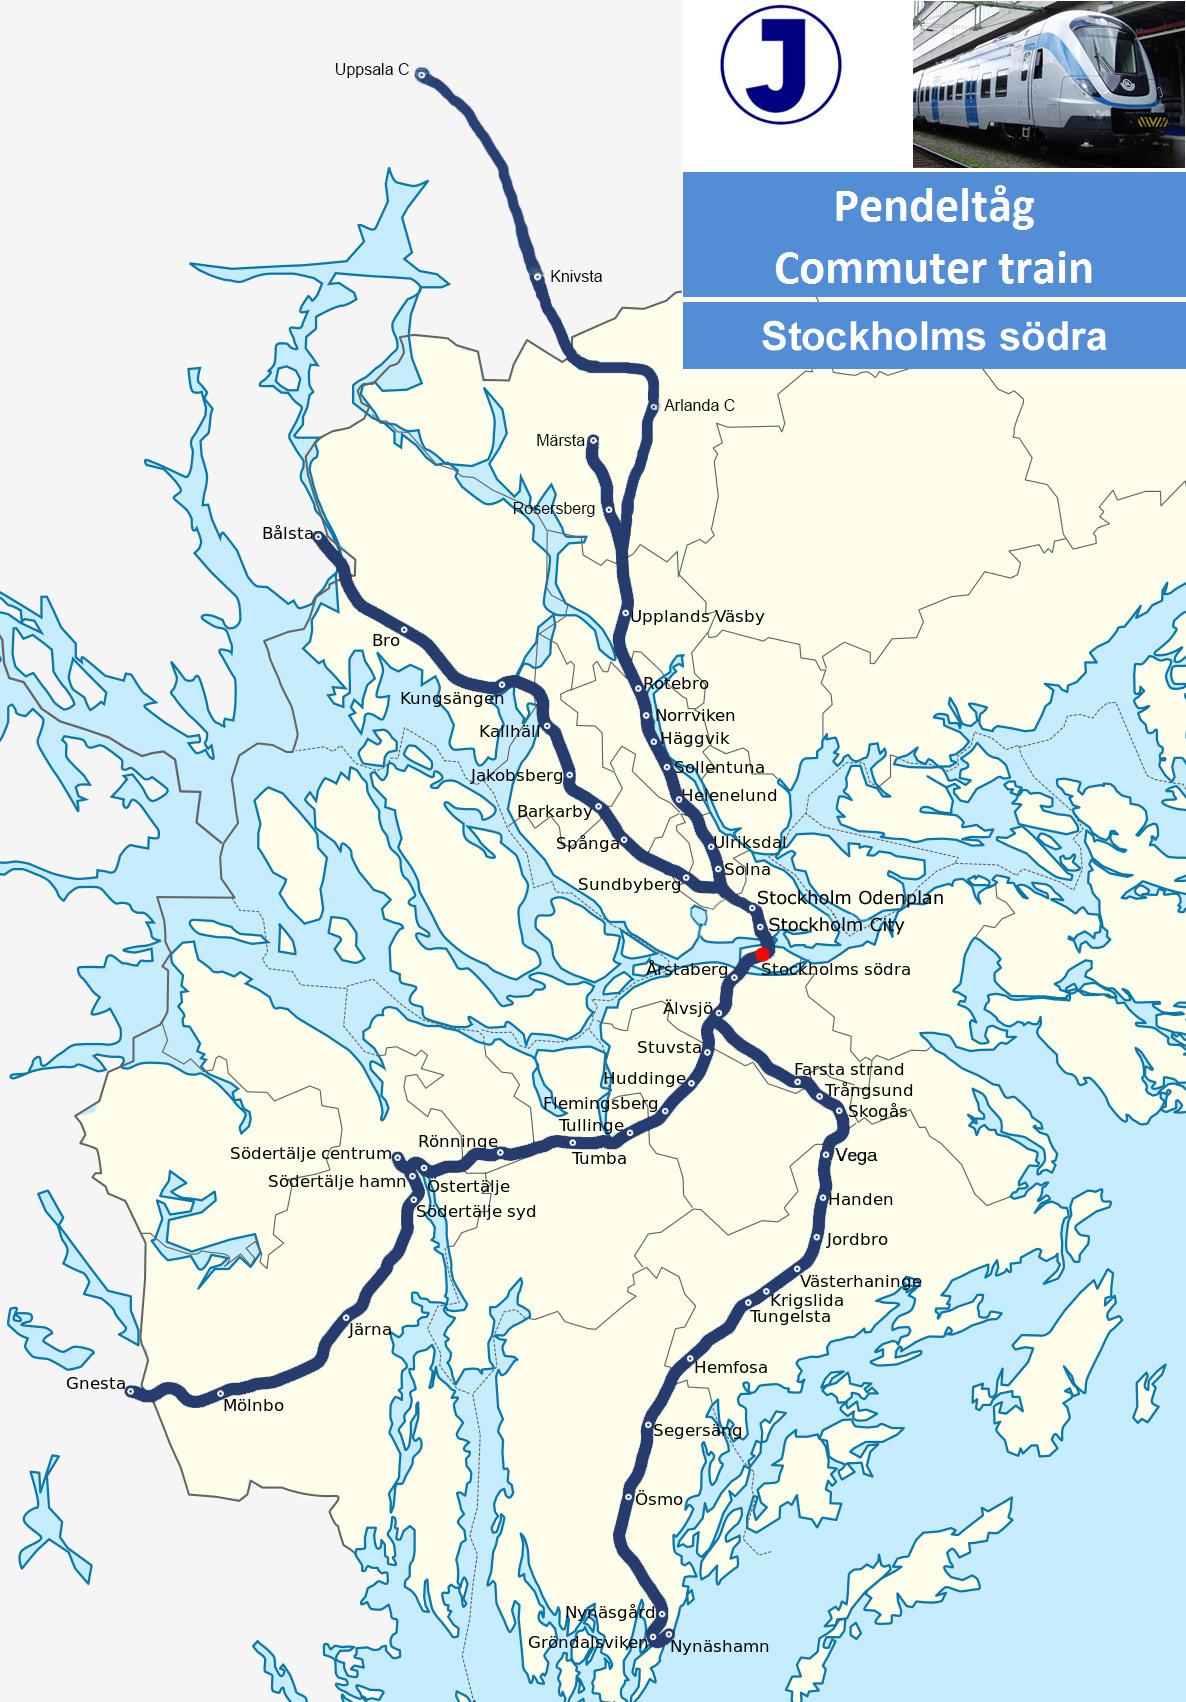 File:Stockholms sodra station map.jpg - Wikimedia Commons